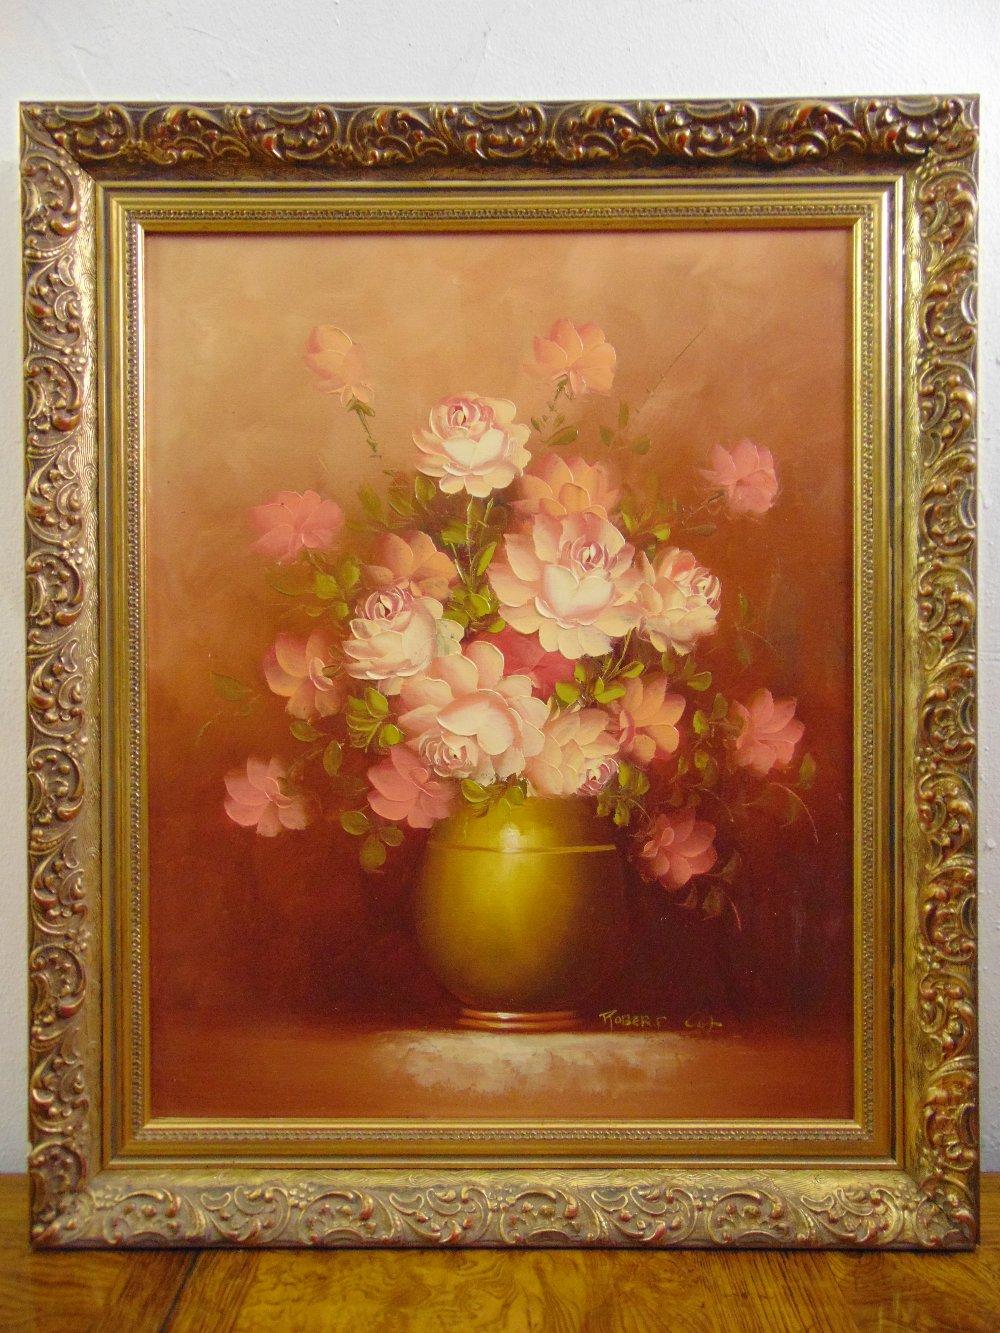 Lot 98 - Robert Cox framed oil on canvas still life of flowers, signed bottom right, 50.5 x 40.5cm